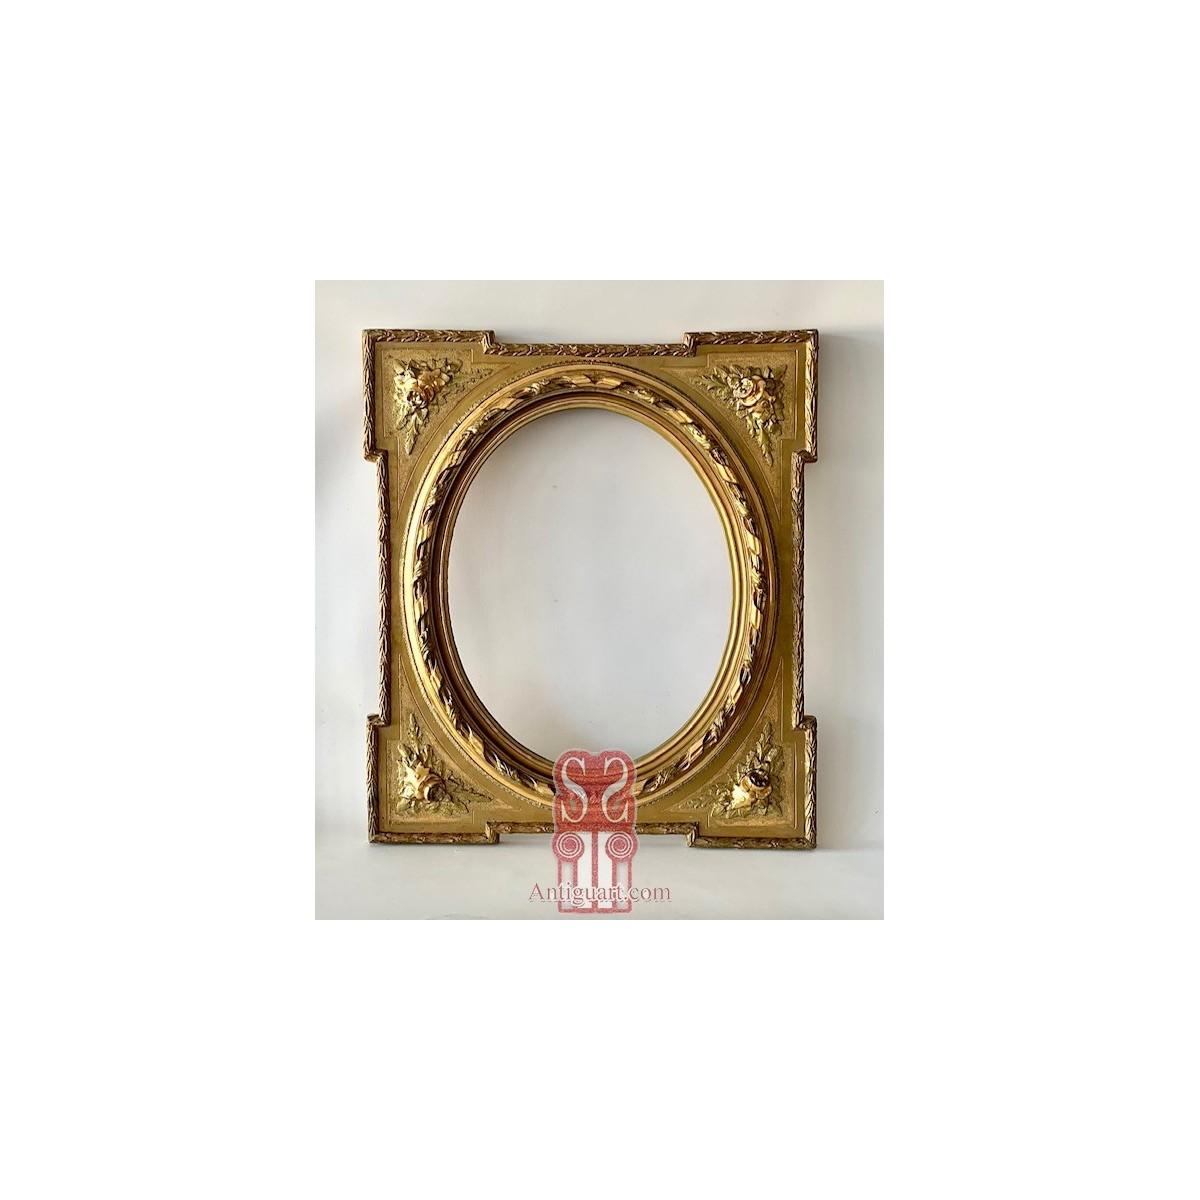 Fine gold wooden frame, 19th